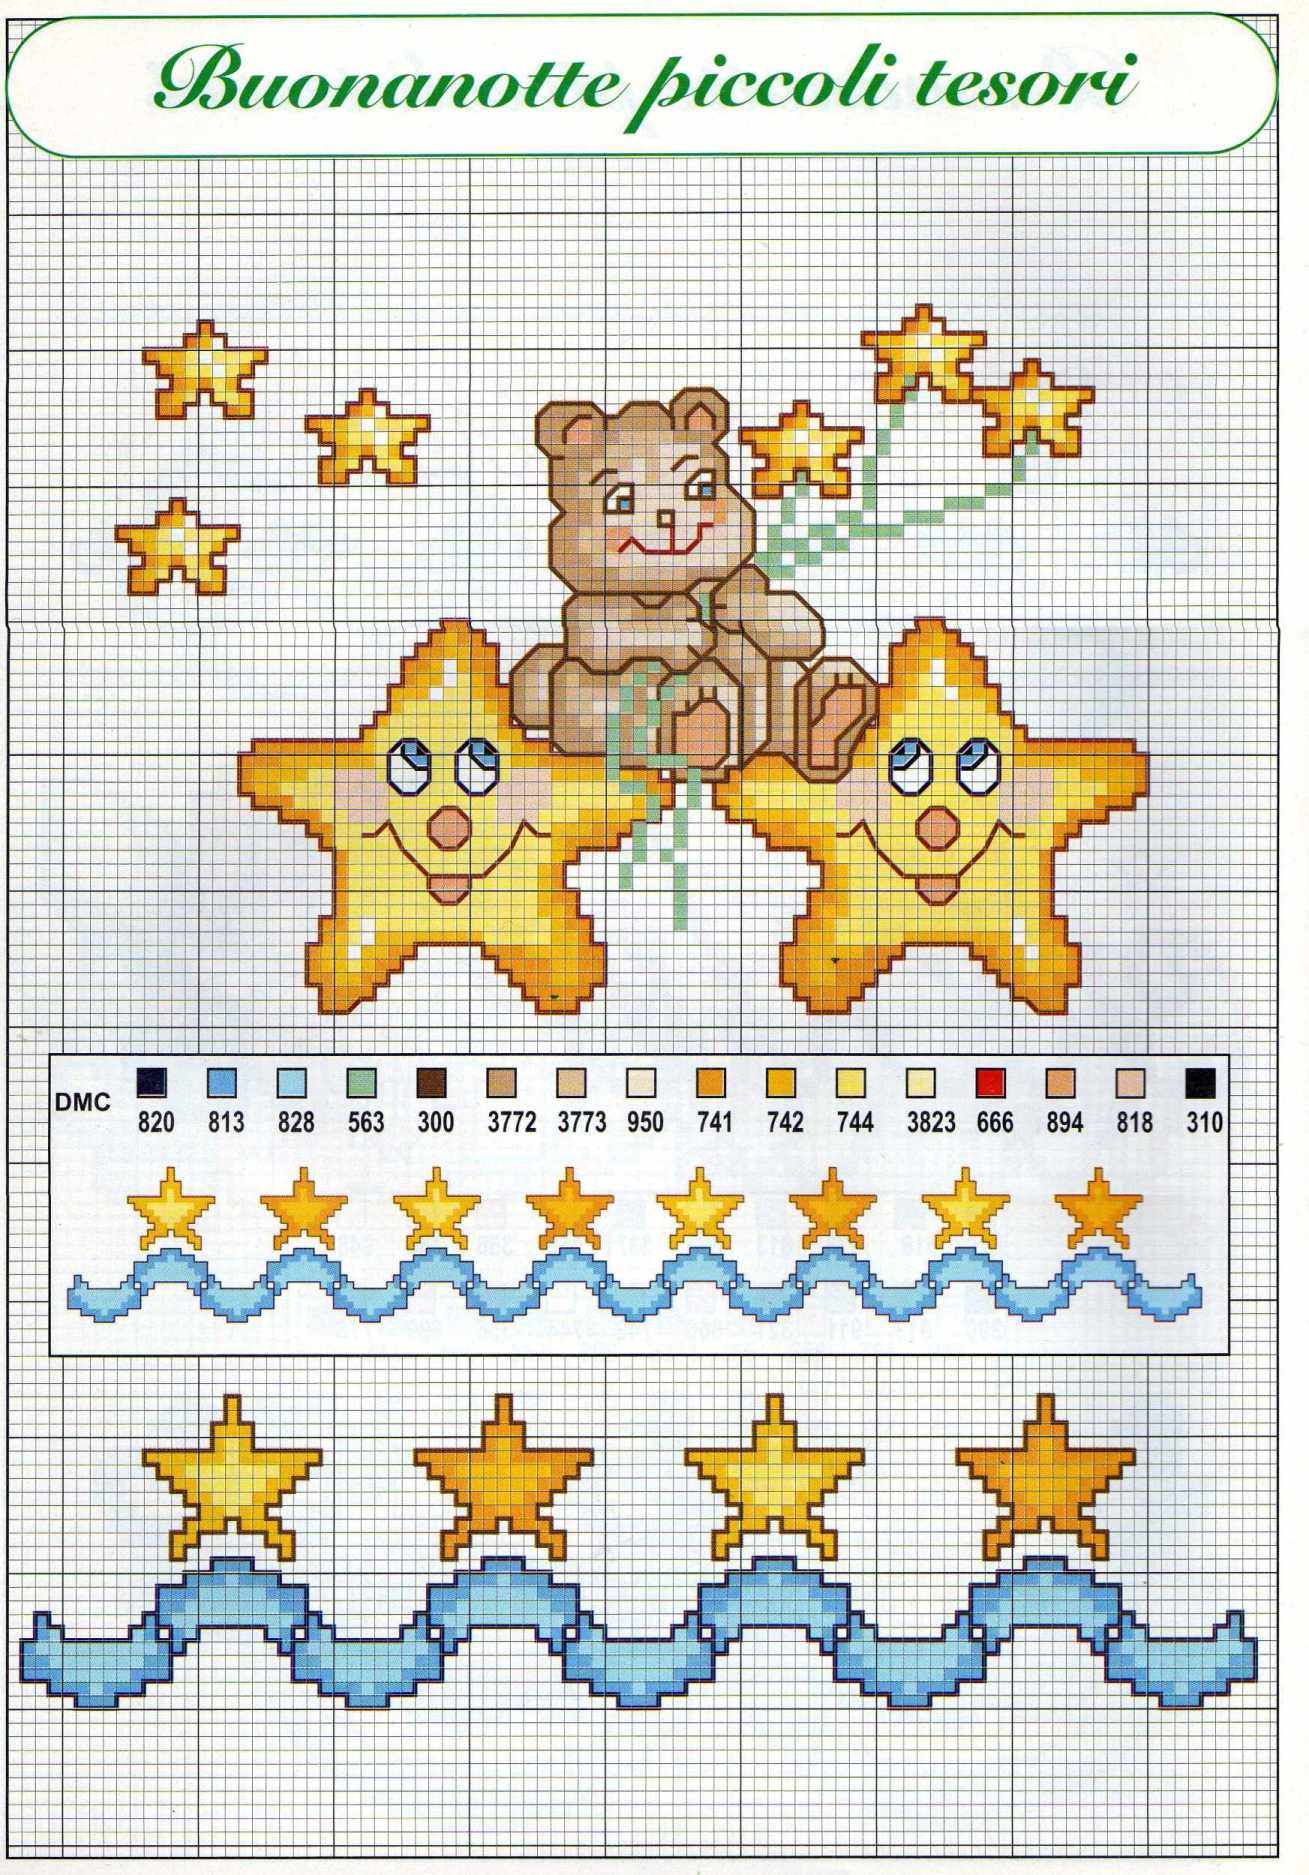 Luna e stelle schemi punto croce per bambini nascita 1 for Punto croce bimbi schemi